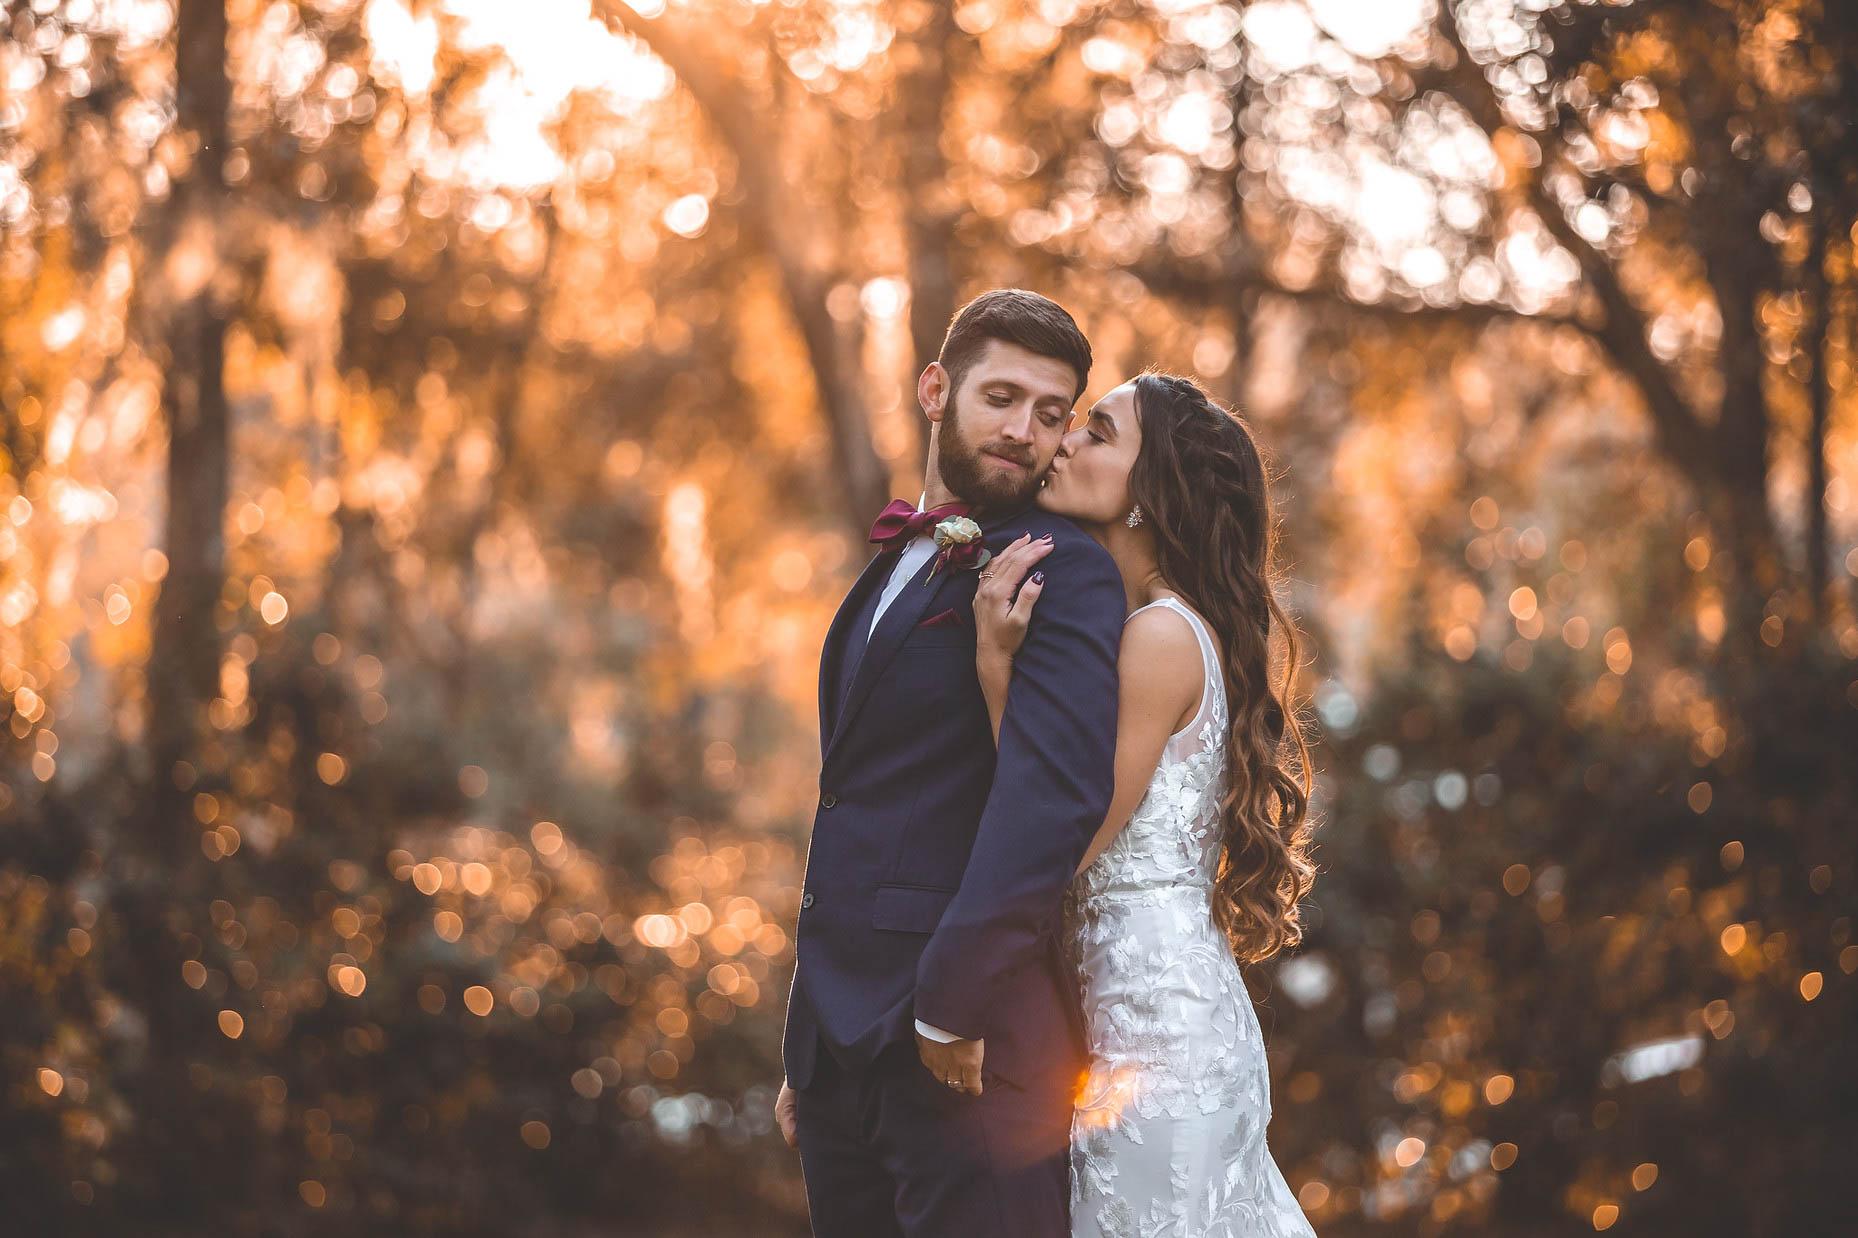 adam-szarmack-bowing-oaks-wedding-photographer-jacksonville-109.jpg